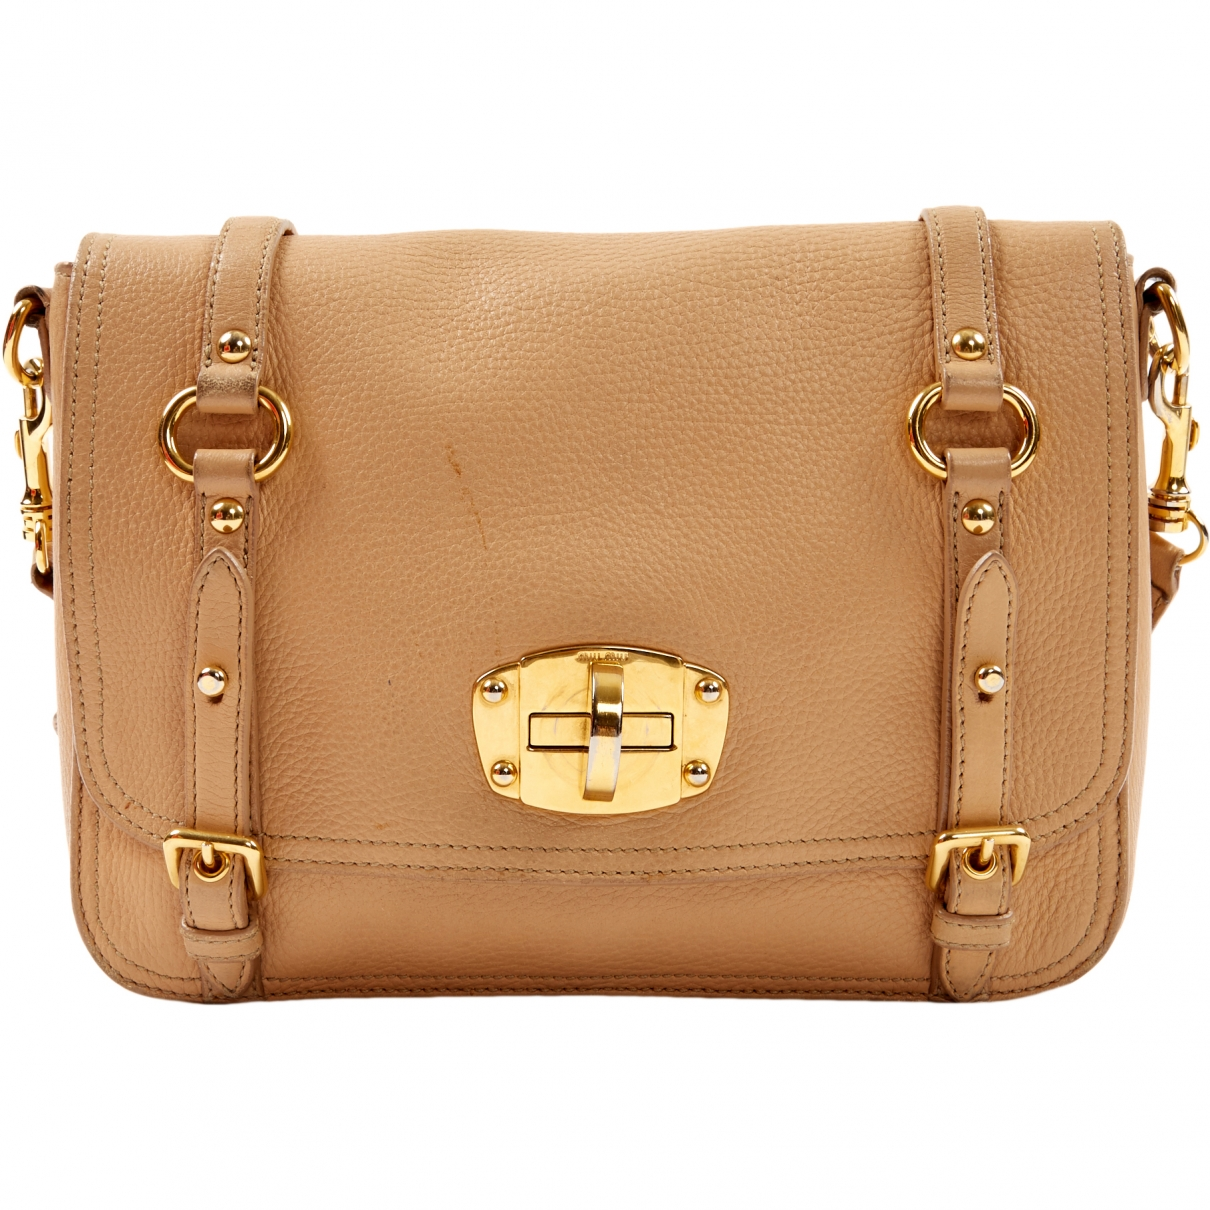 Miu Miu \N Beige Leather handbag for Women \N